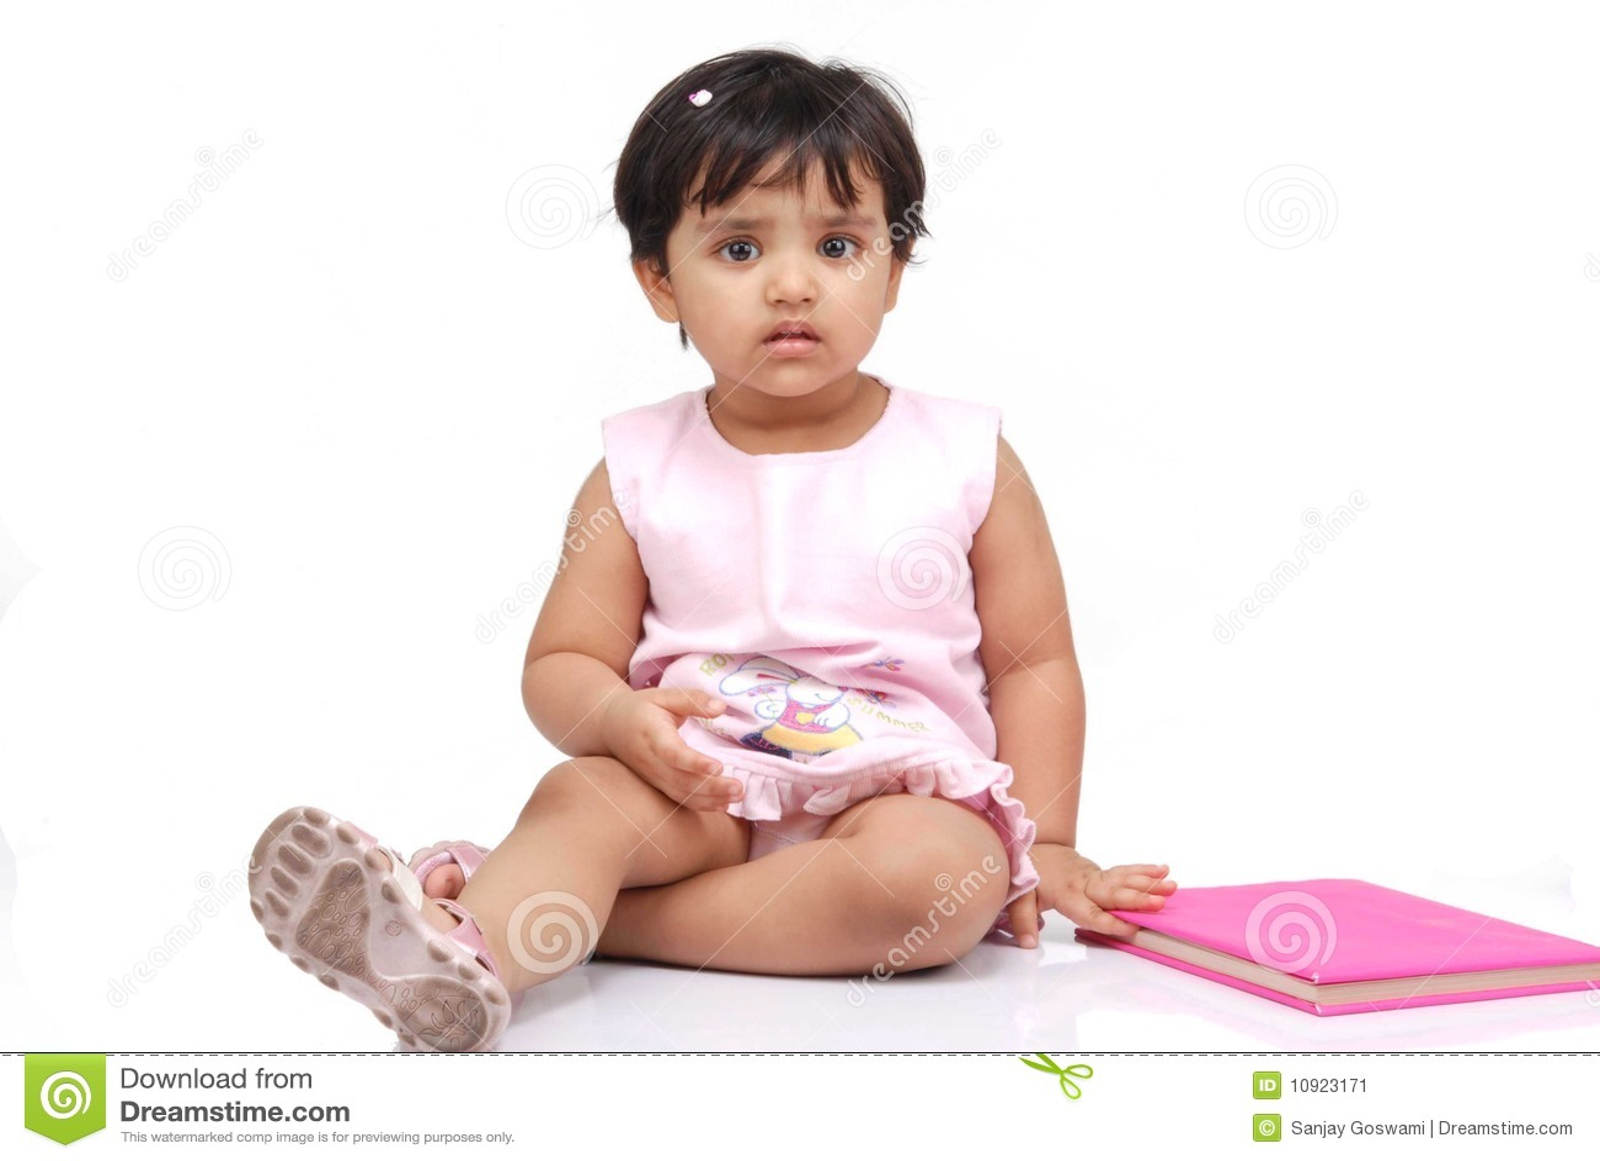 2 3 years old baby girl stock image image of innocence 10923171